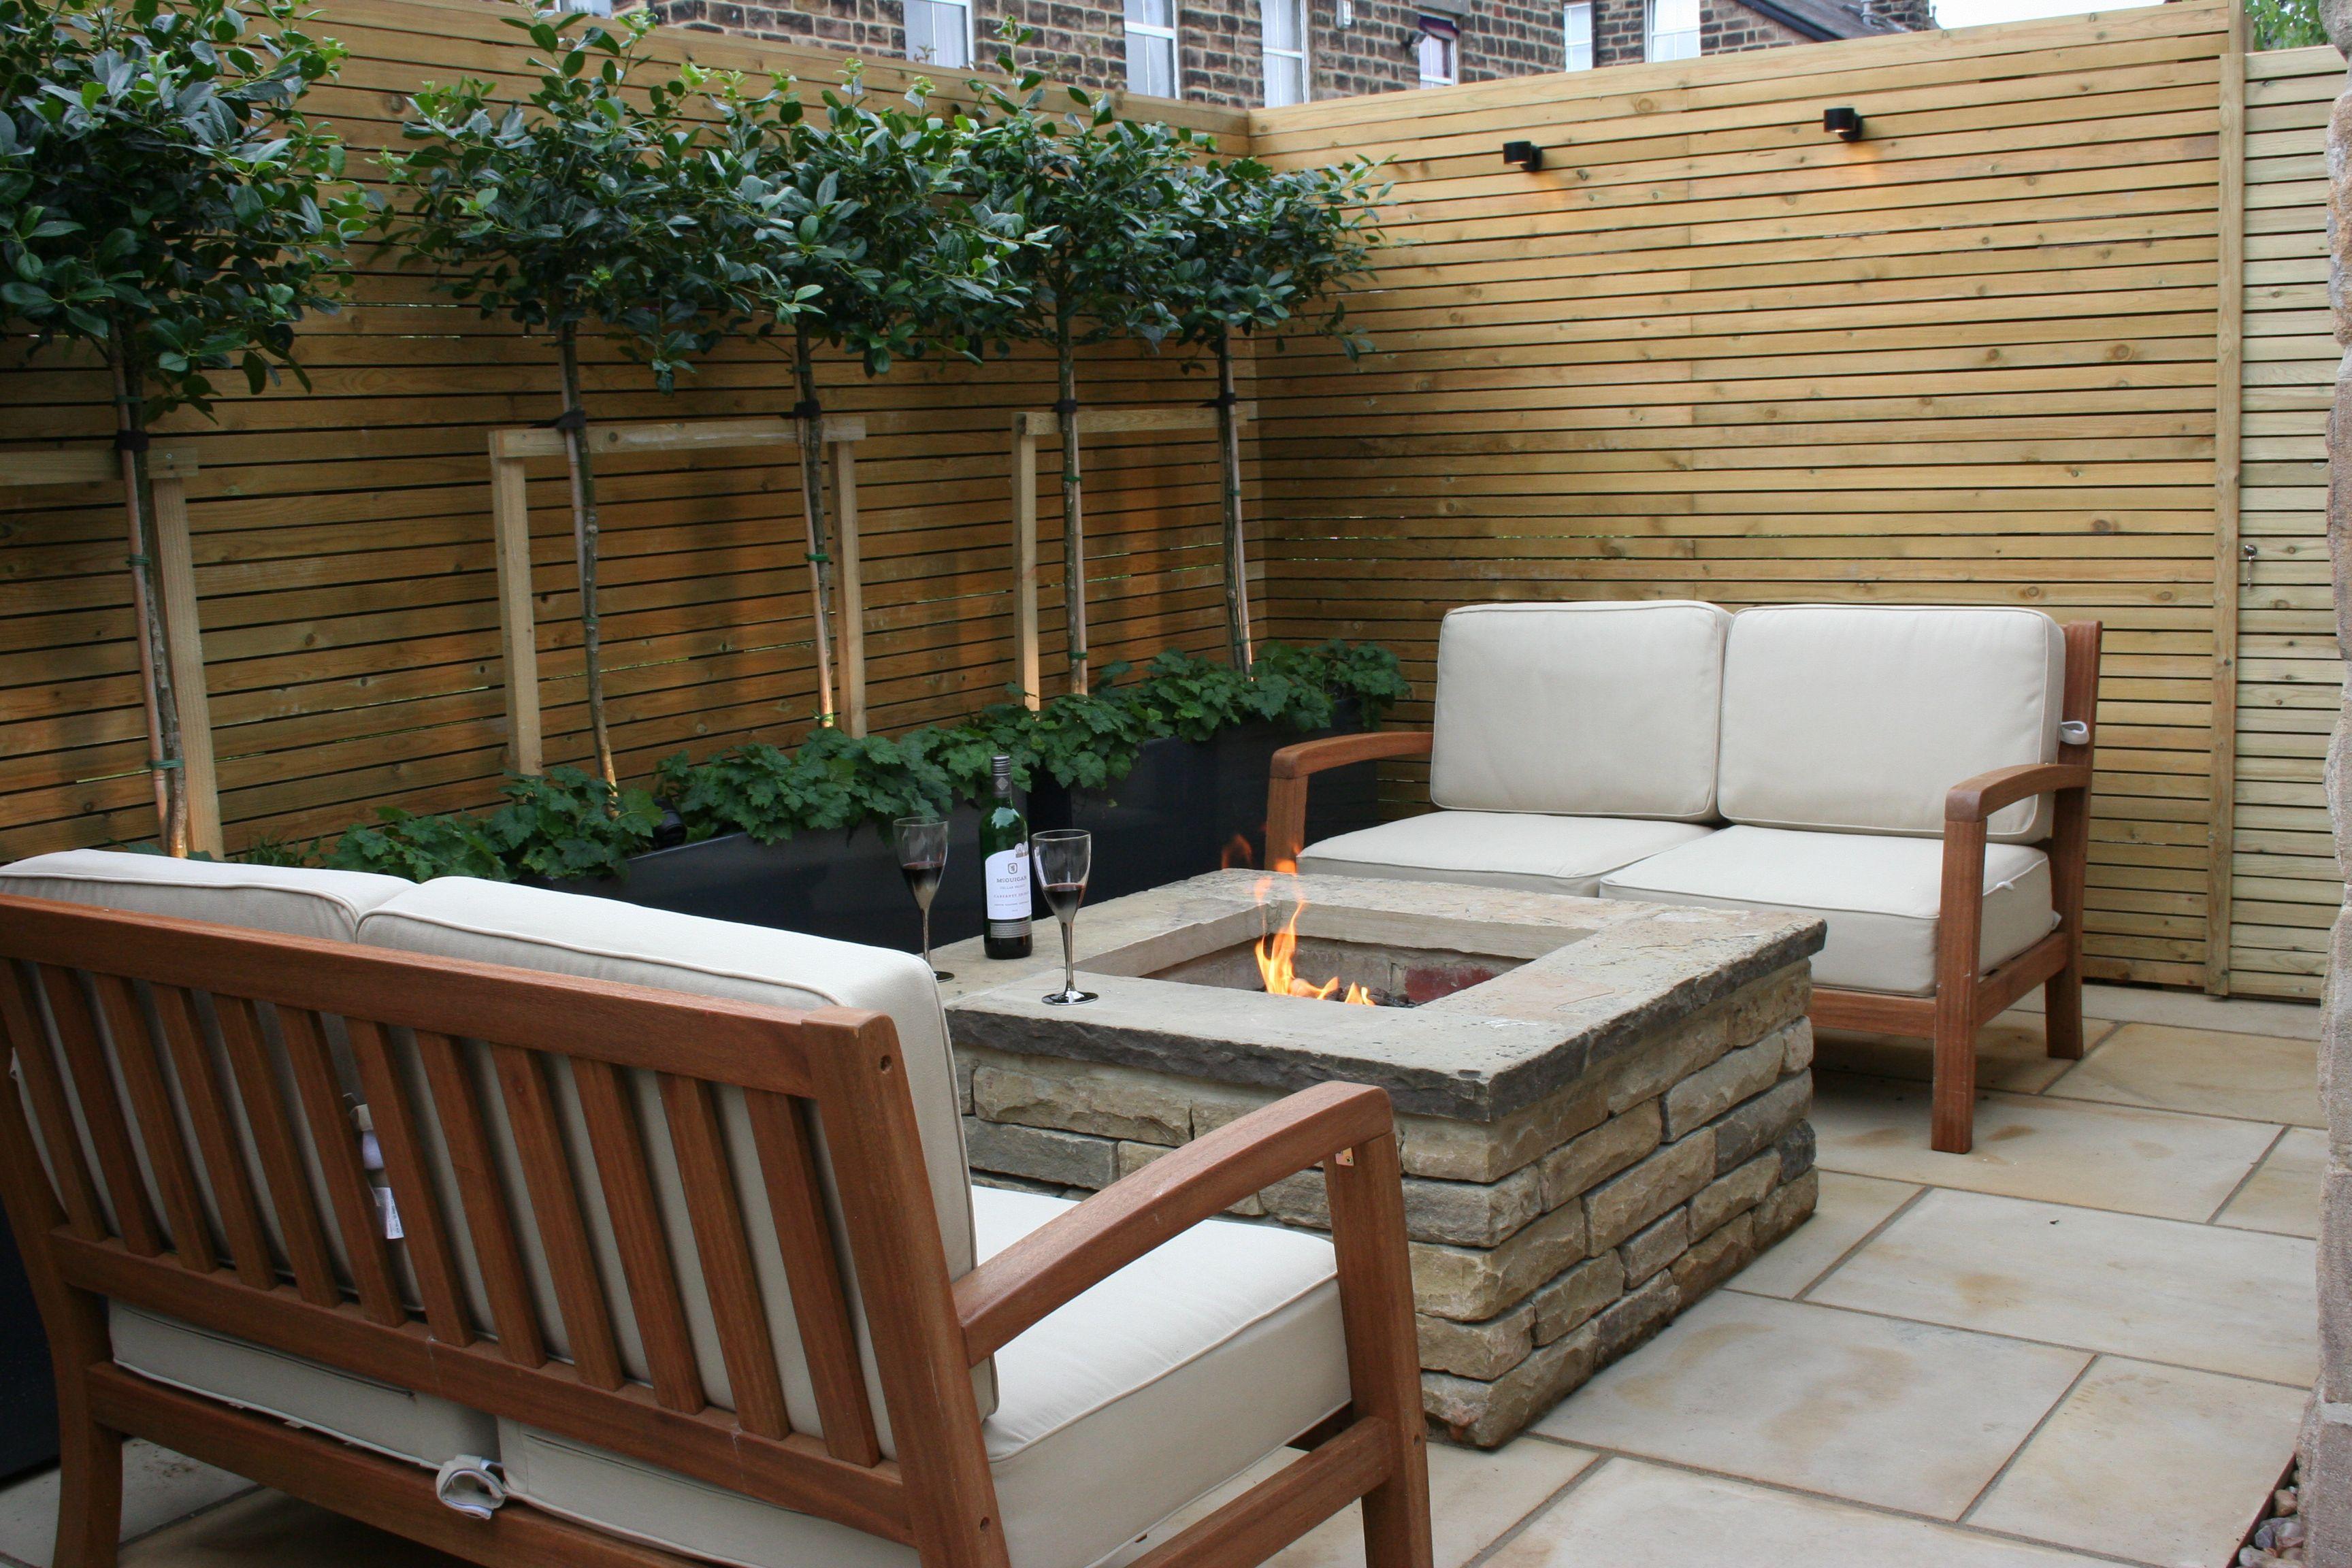 Interior Design Ideas, Redecorating & Remodeling Photos | Gardens ...